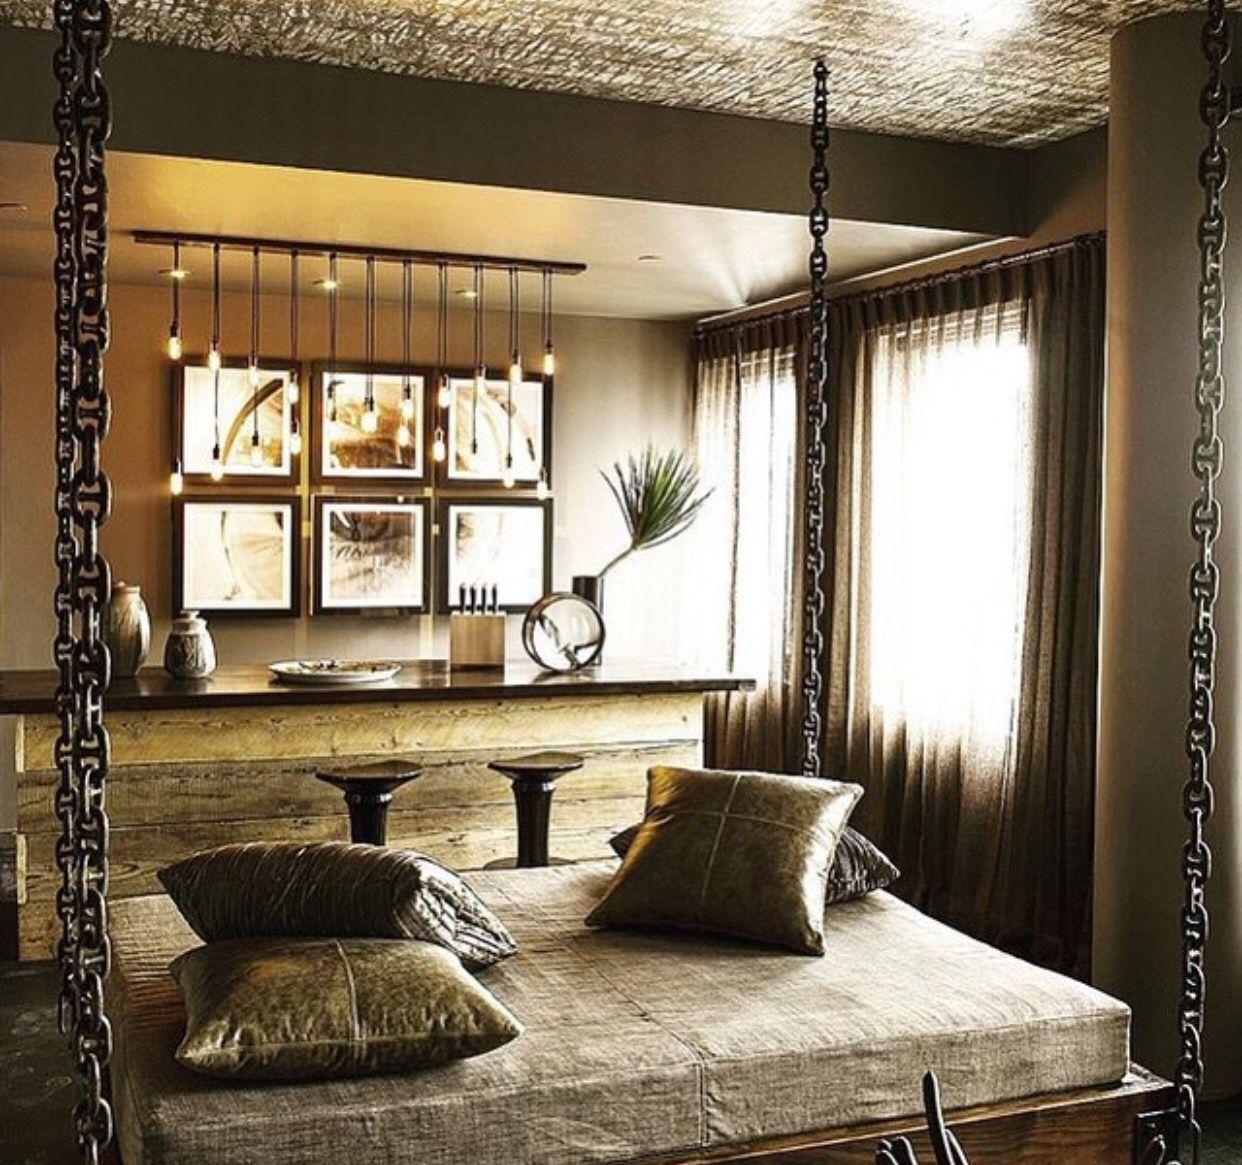 Hanging beds hanging beds pinterest hanging beds